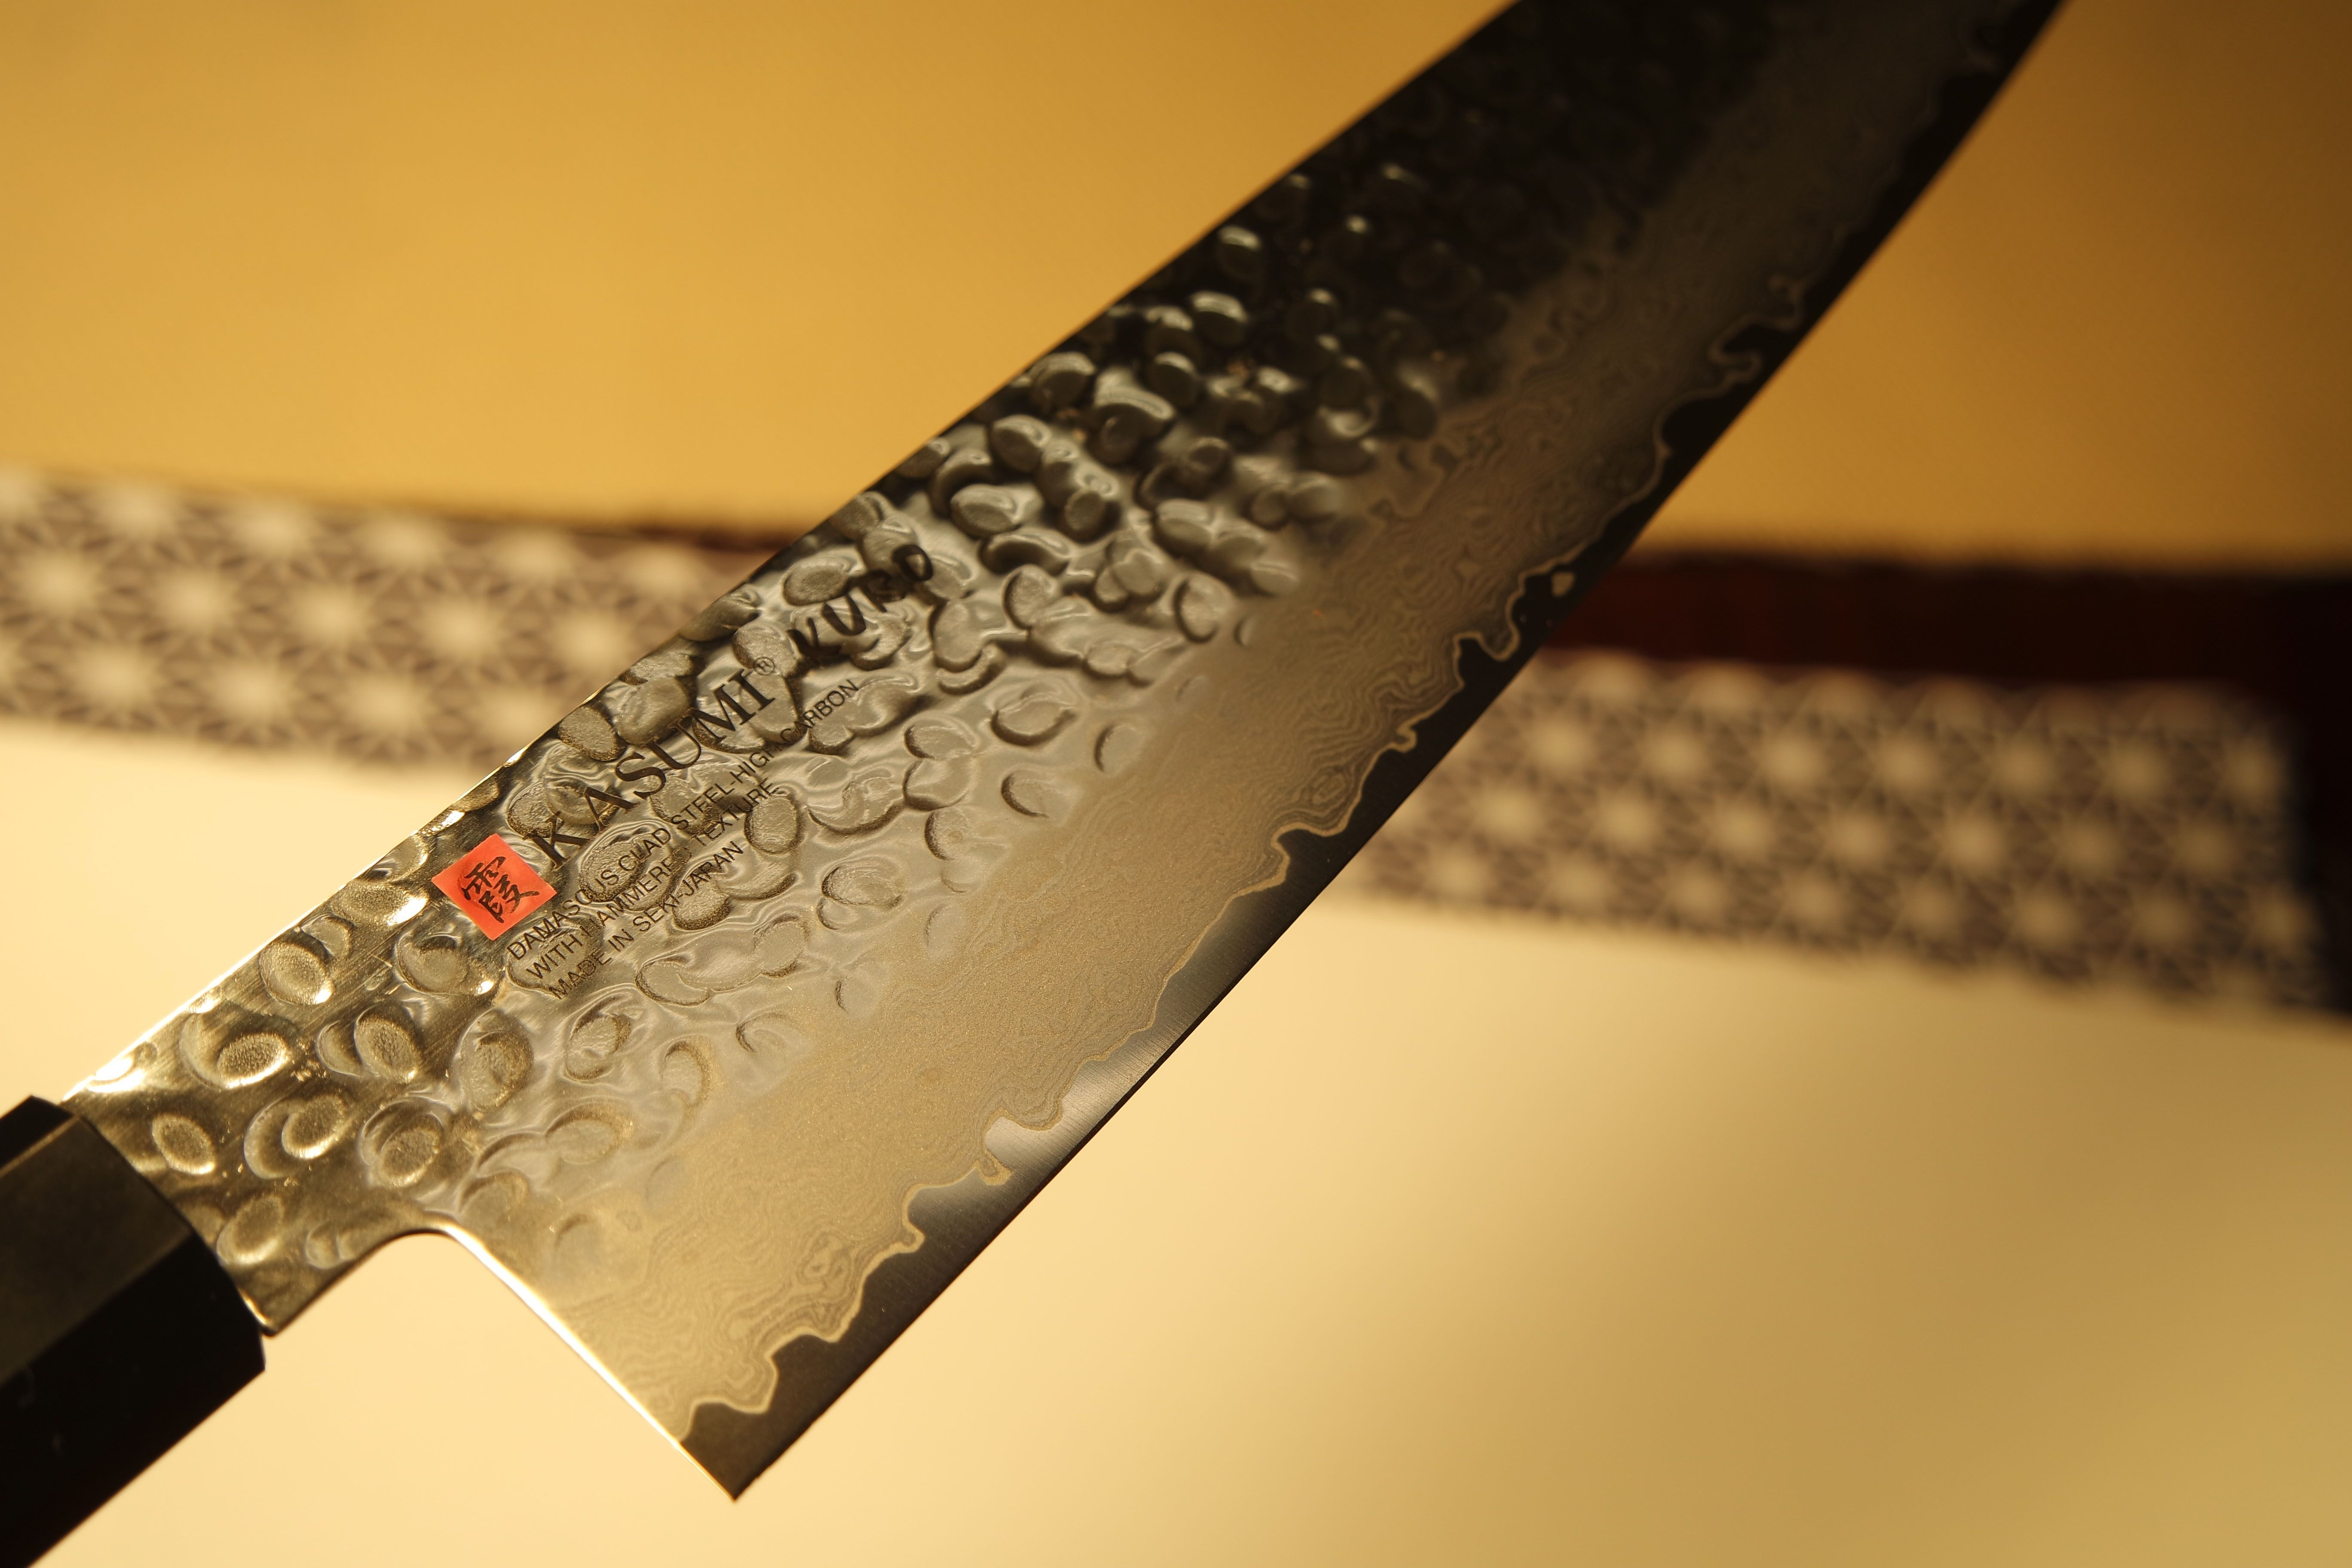 Kasumi Kuro En 2020 Couteau Damas Couteau Damas